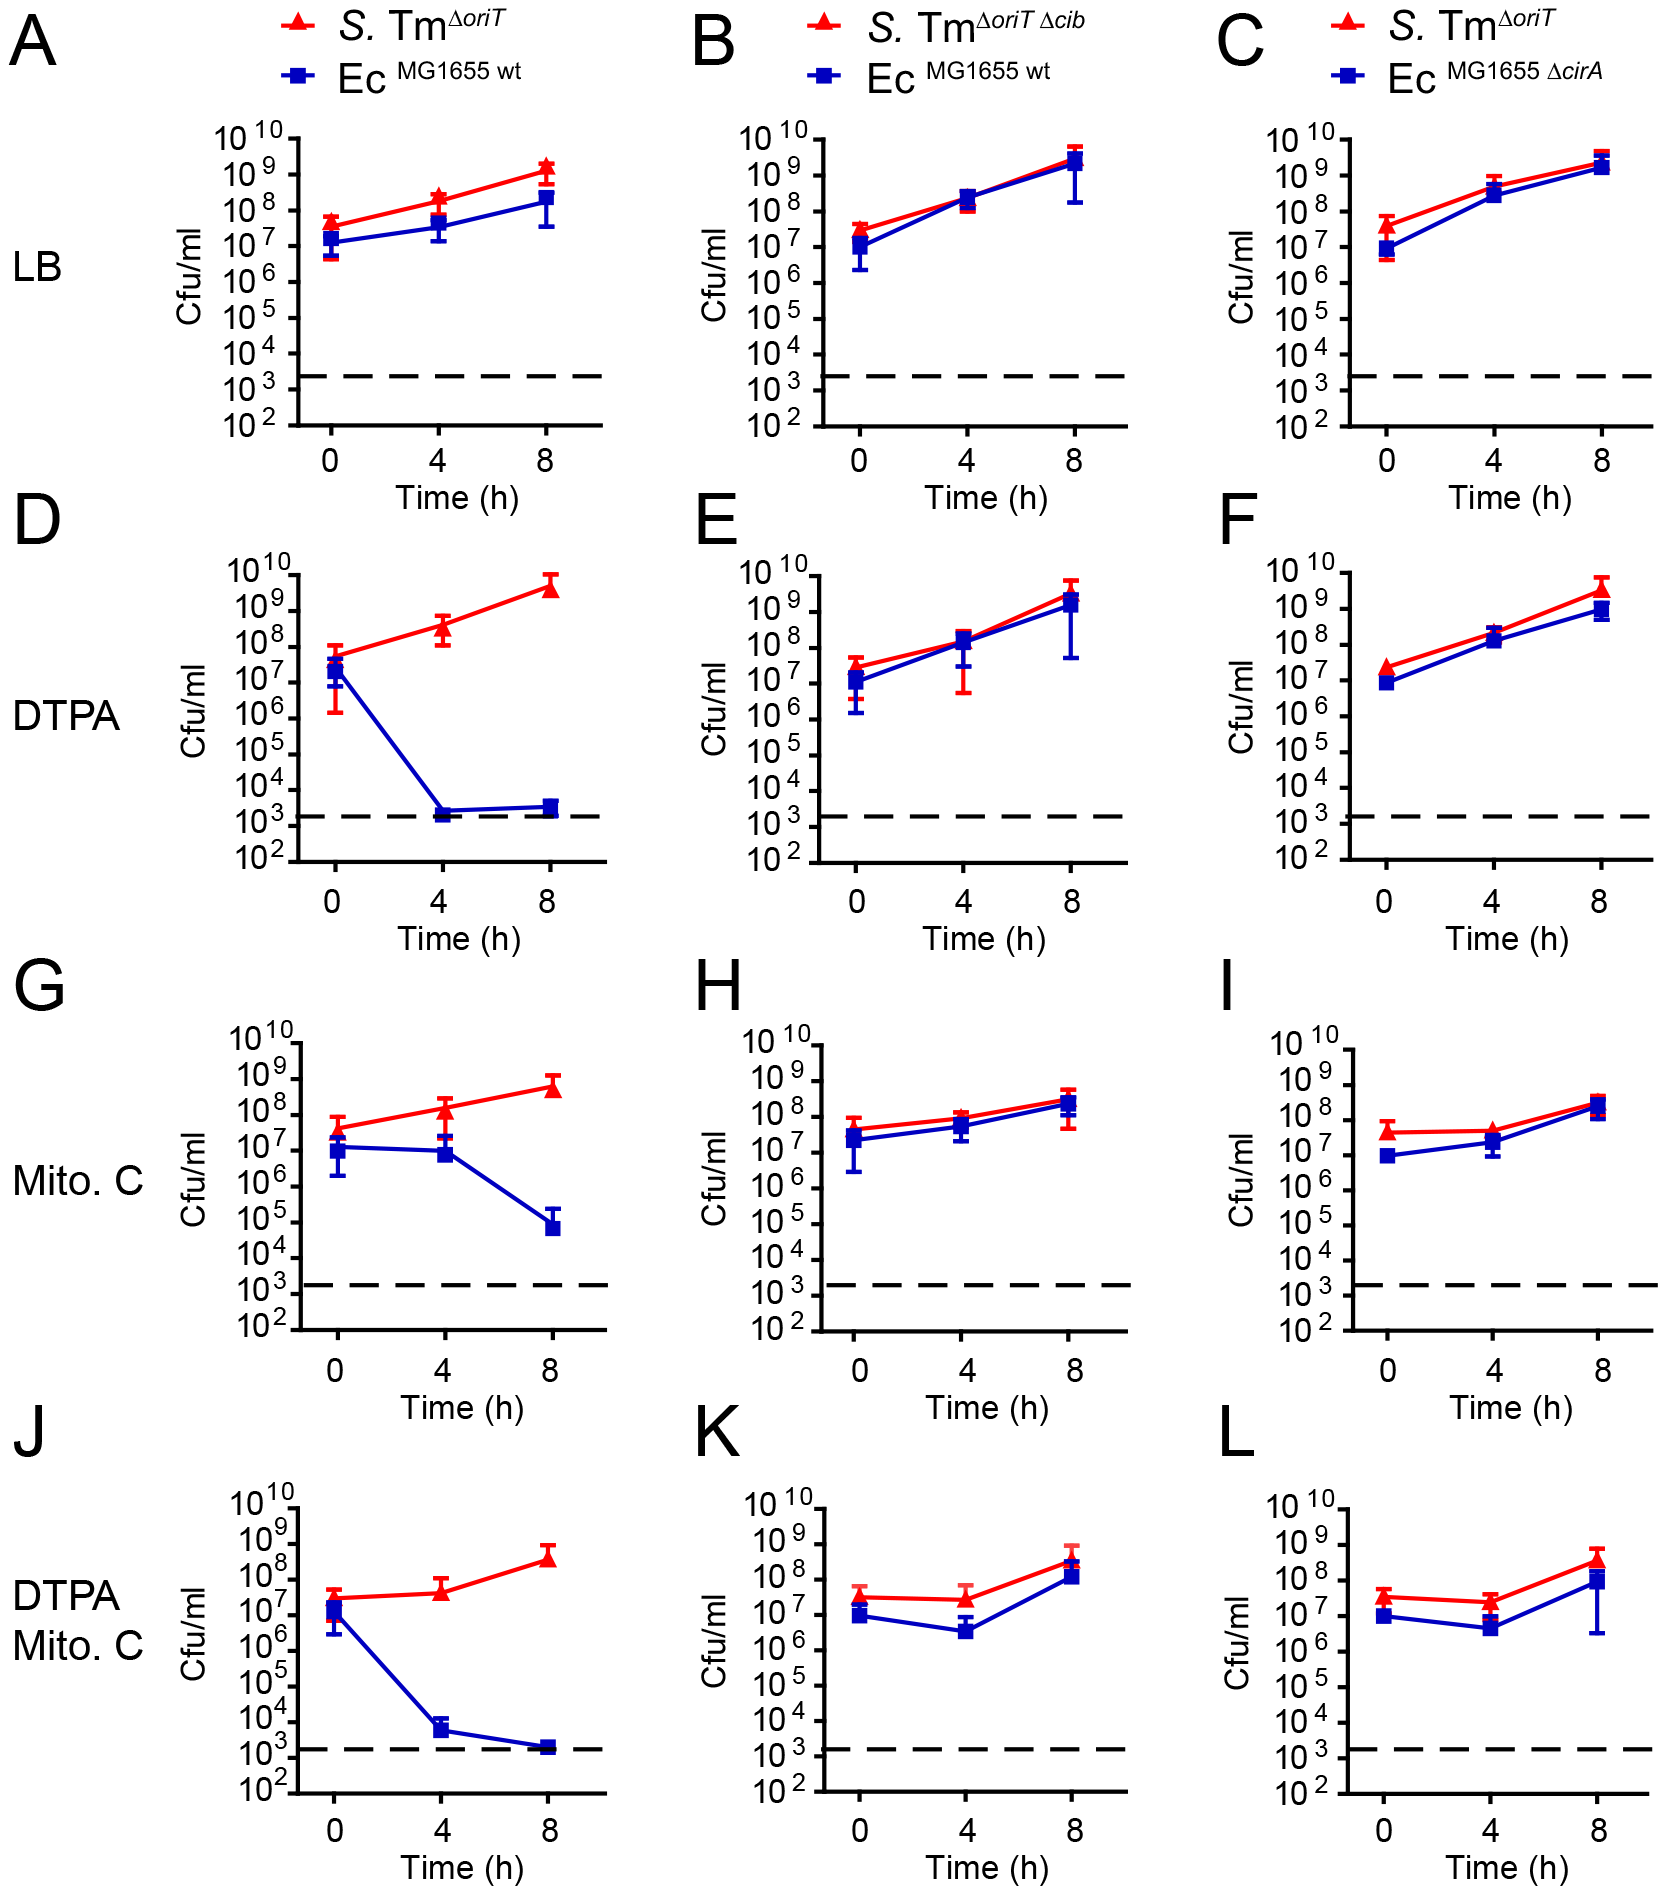 ColIb dependent competition of <i>S.</i> Tm and <i>E. coli in vitro</i>.